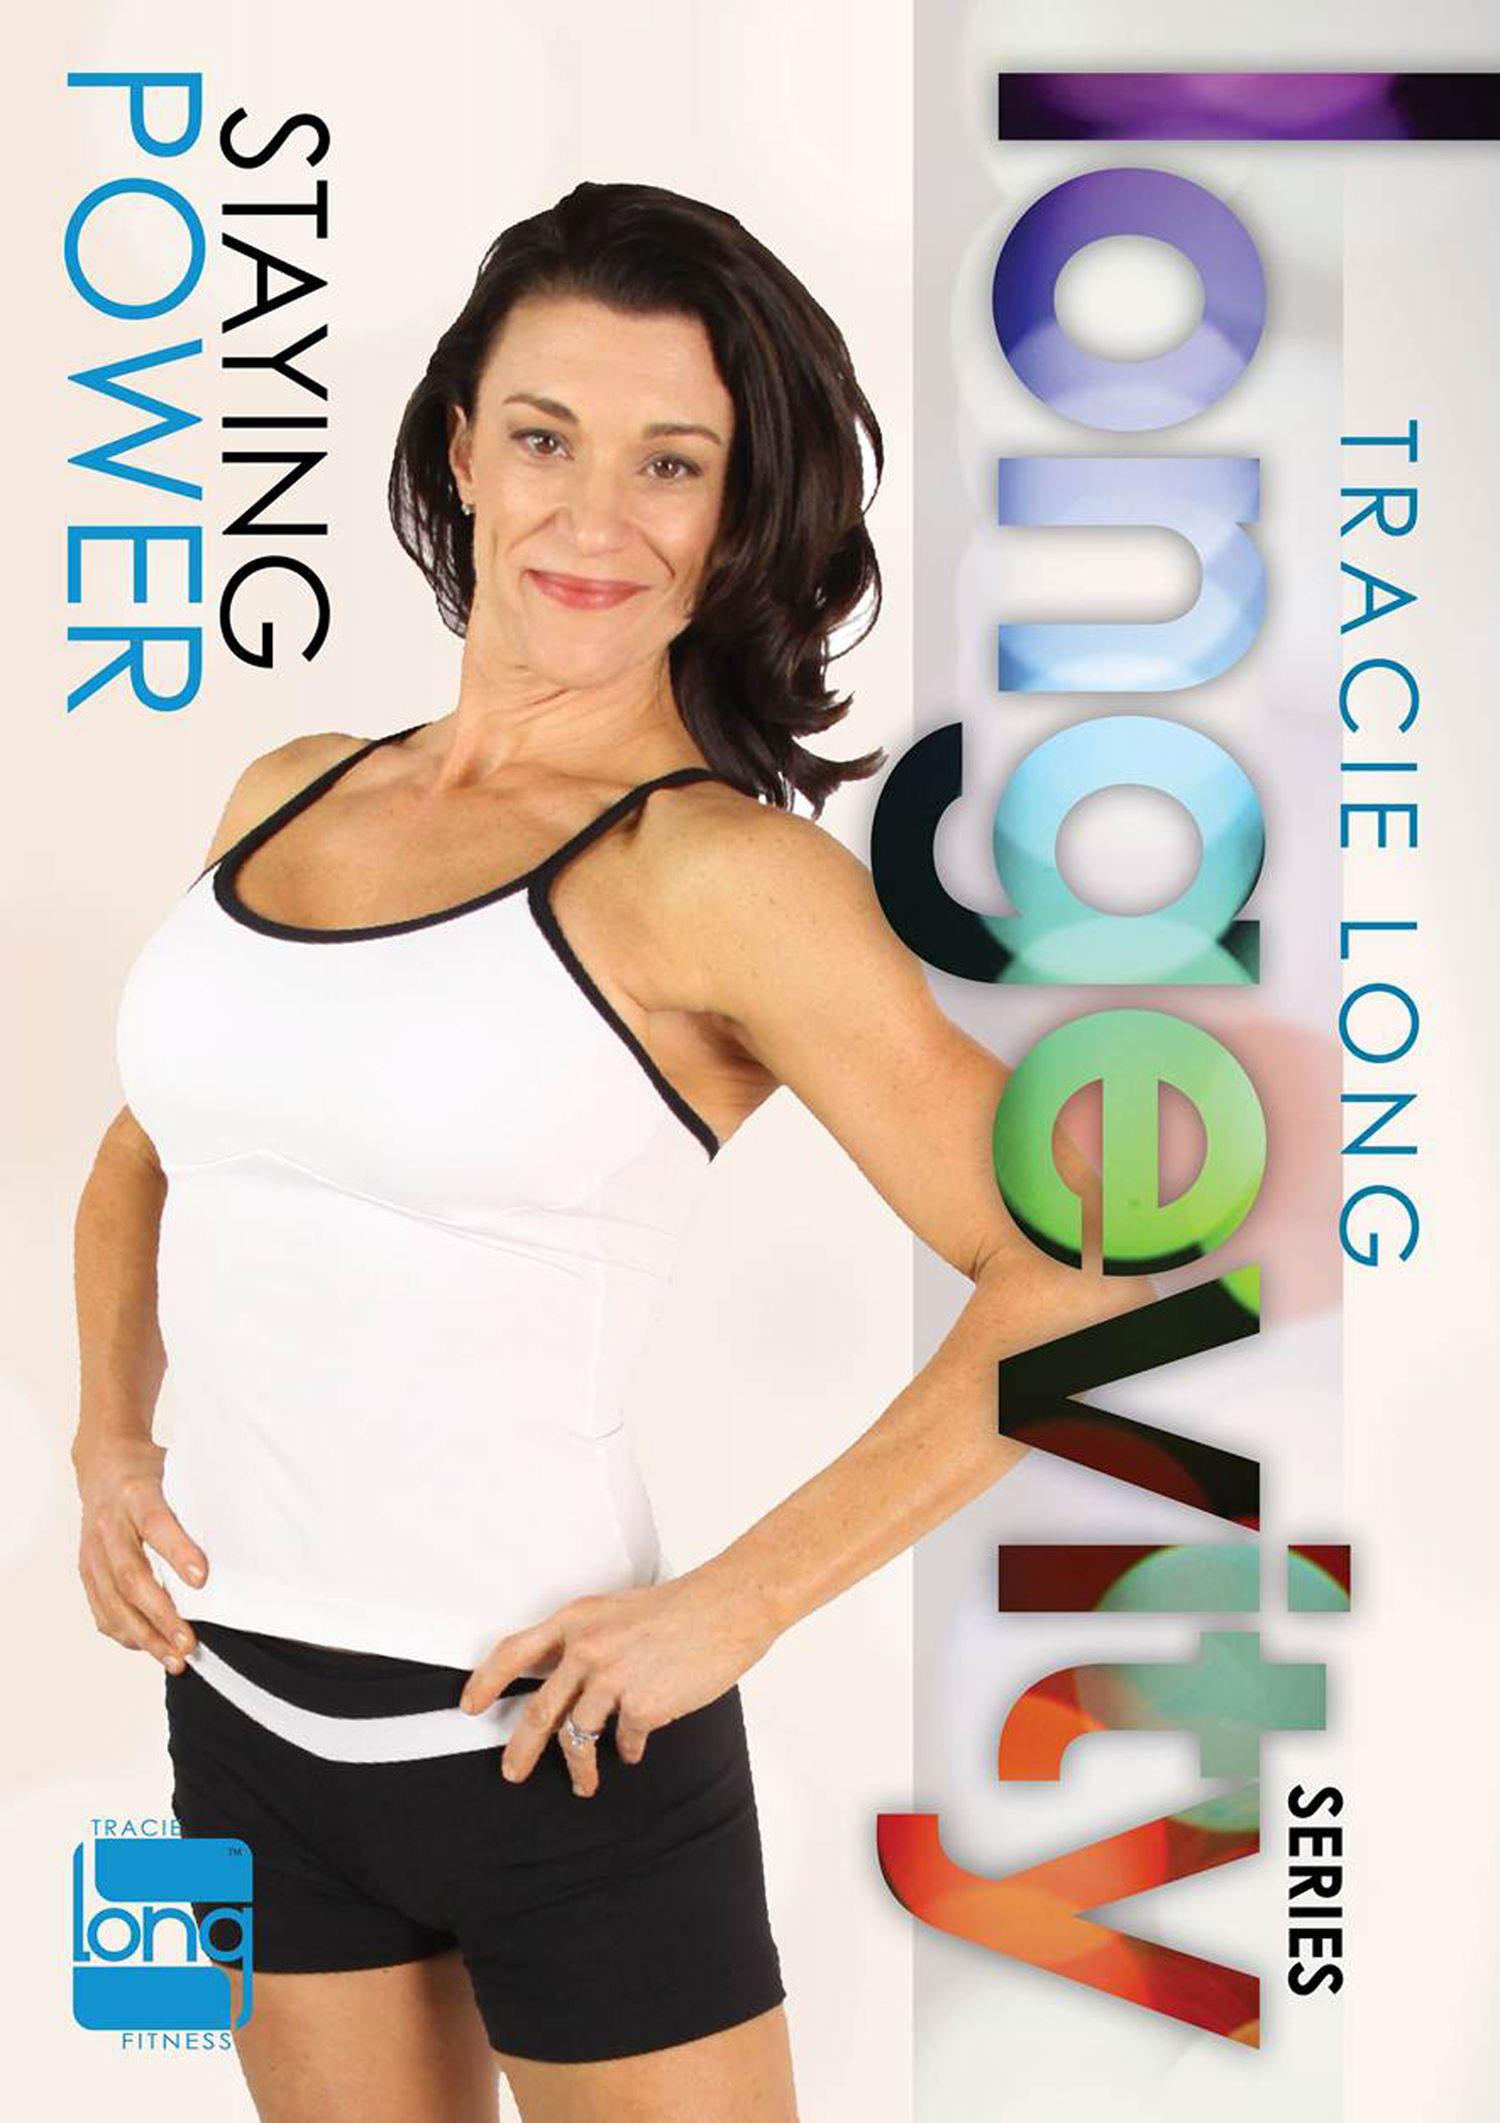 Tracie Long: Longevity Series - Staying Power